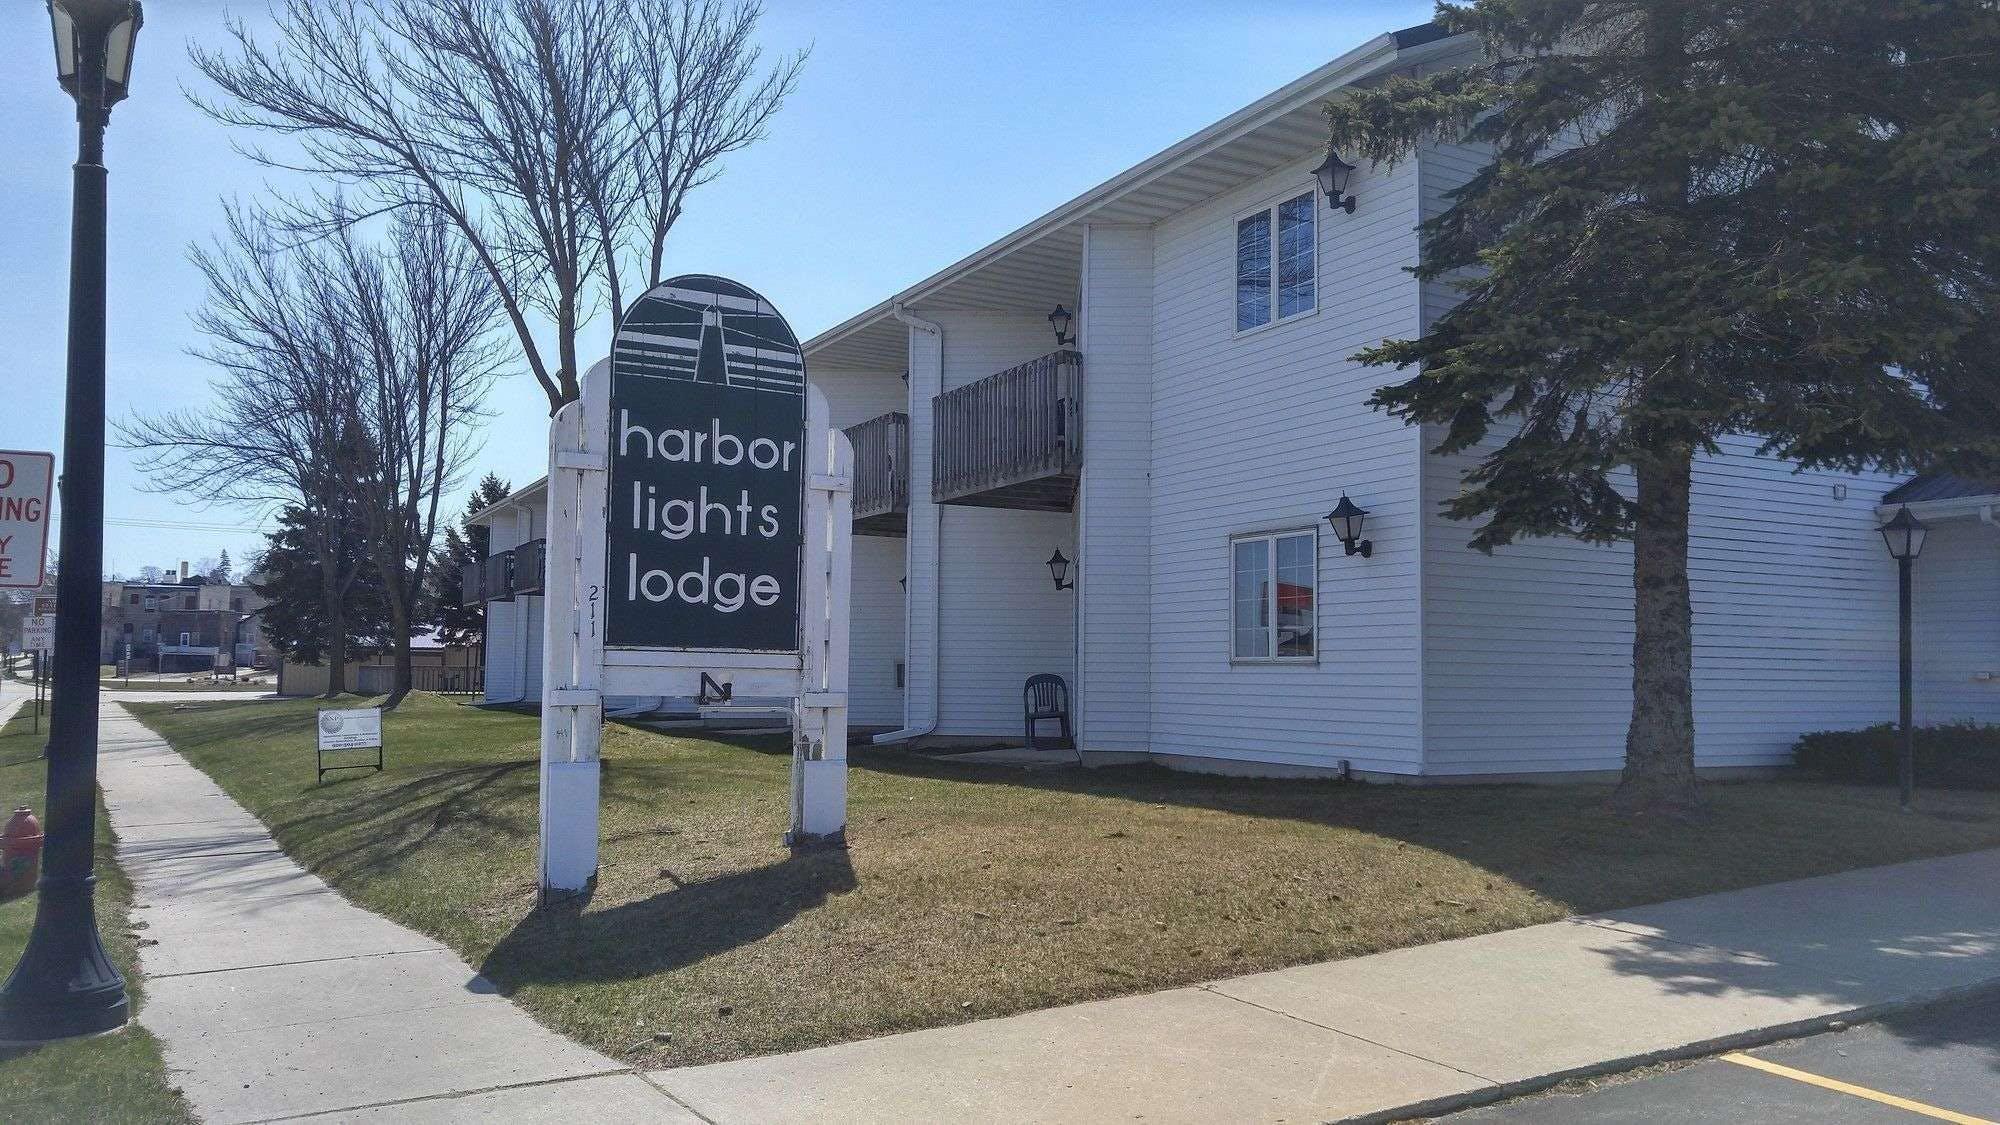 Harbor Lights Lodge